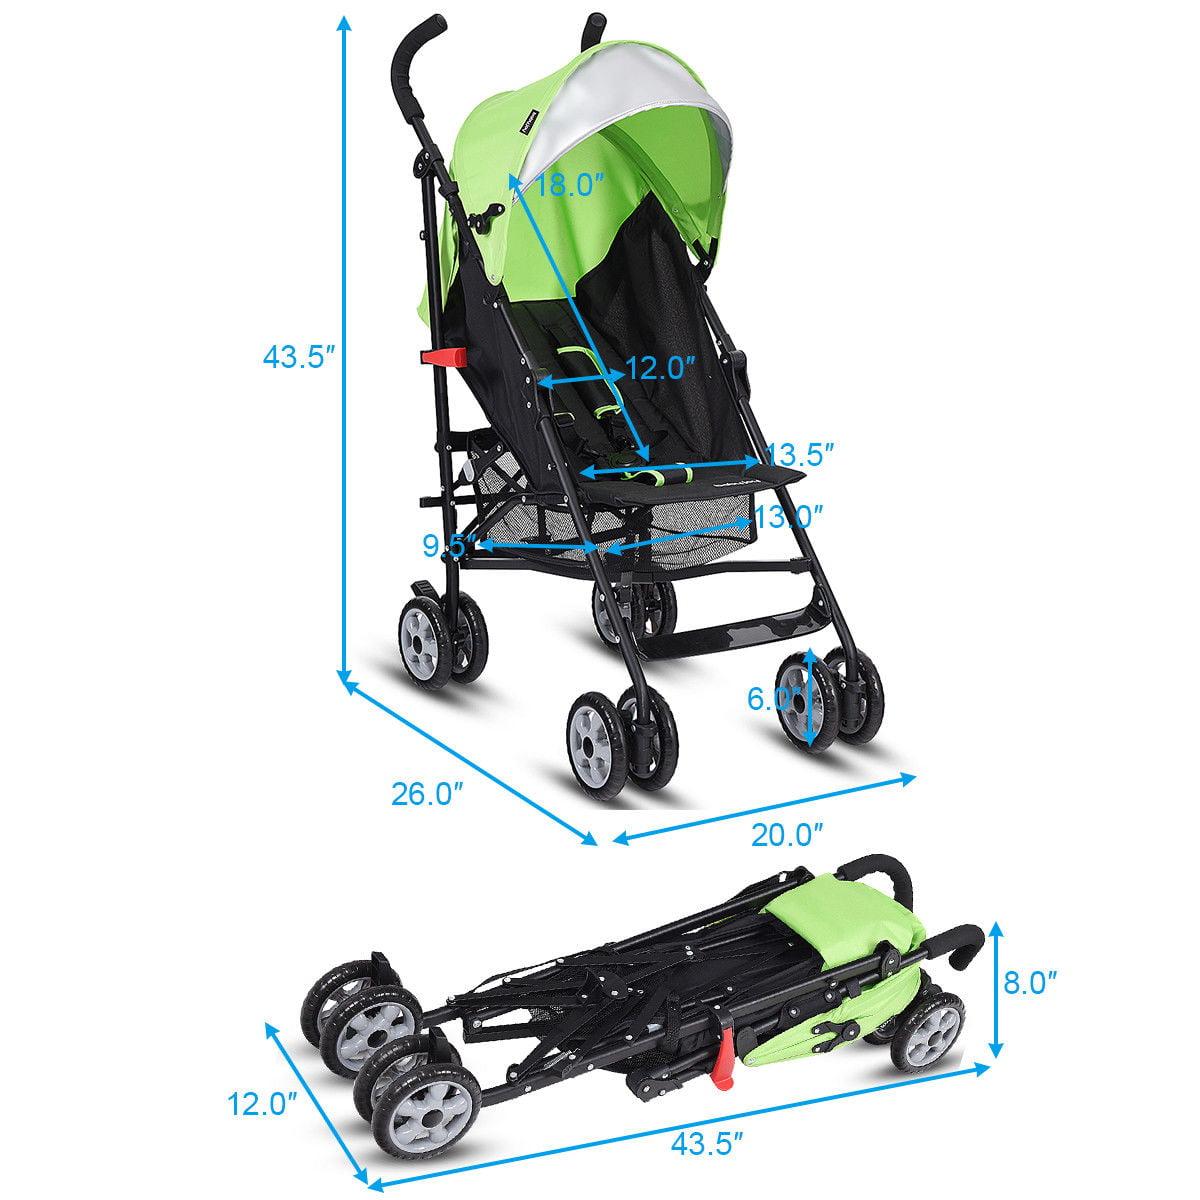 Folding Lightweight Baby Toddler Umbrella Travel Stroller w// Storage Basket New